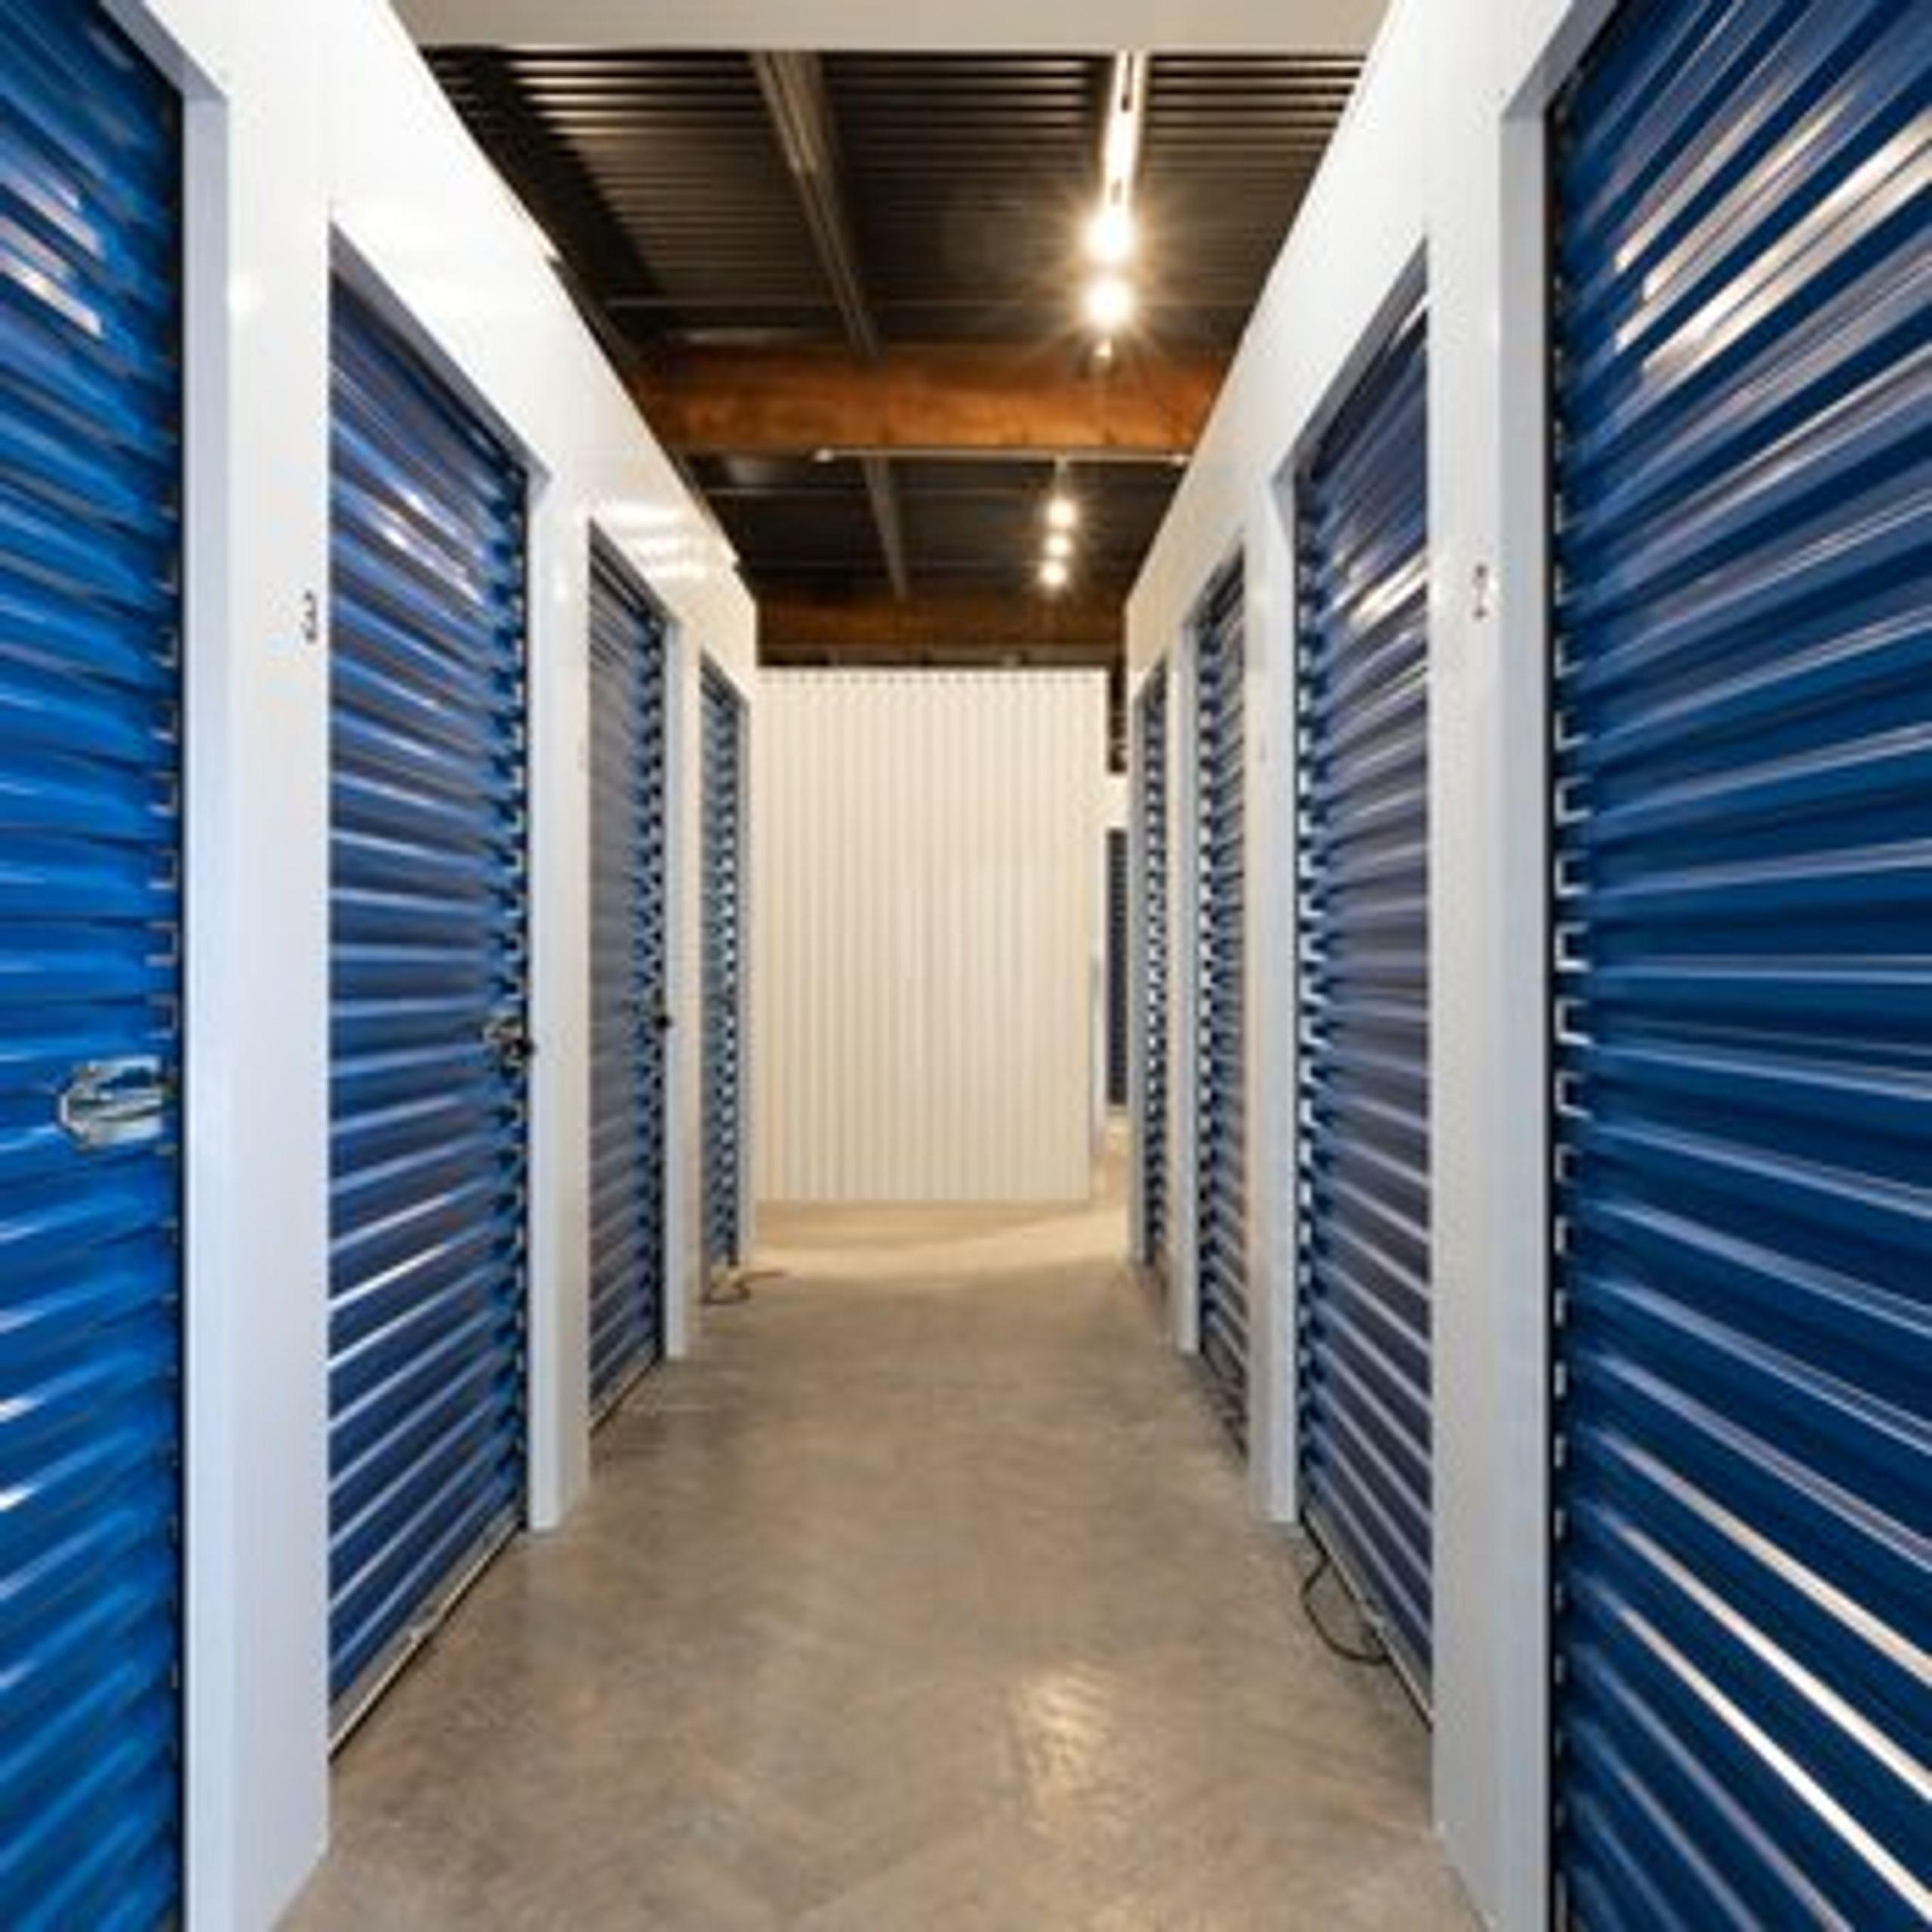 8x8 Self Storage Unit self storage unit